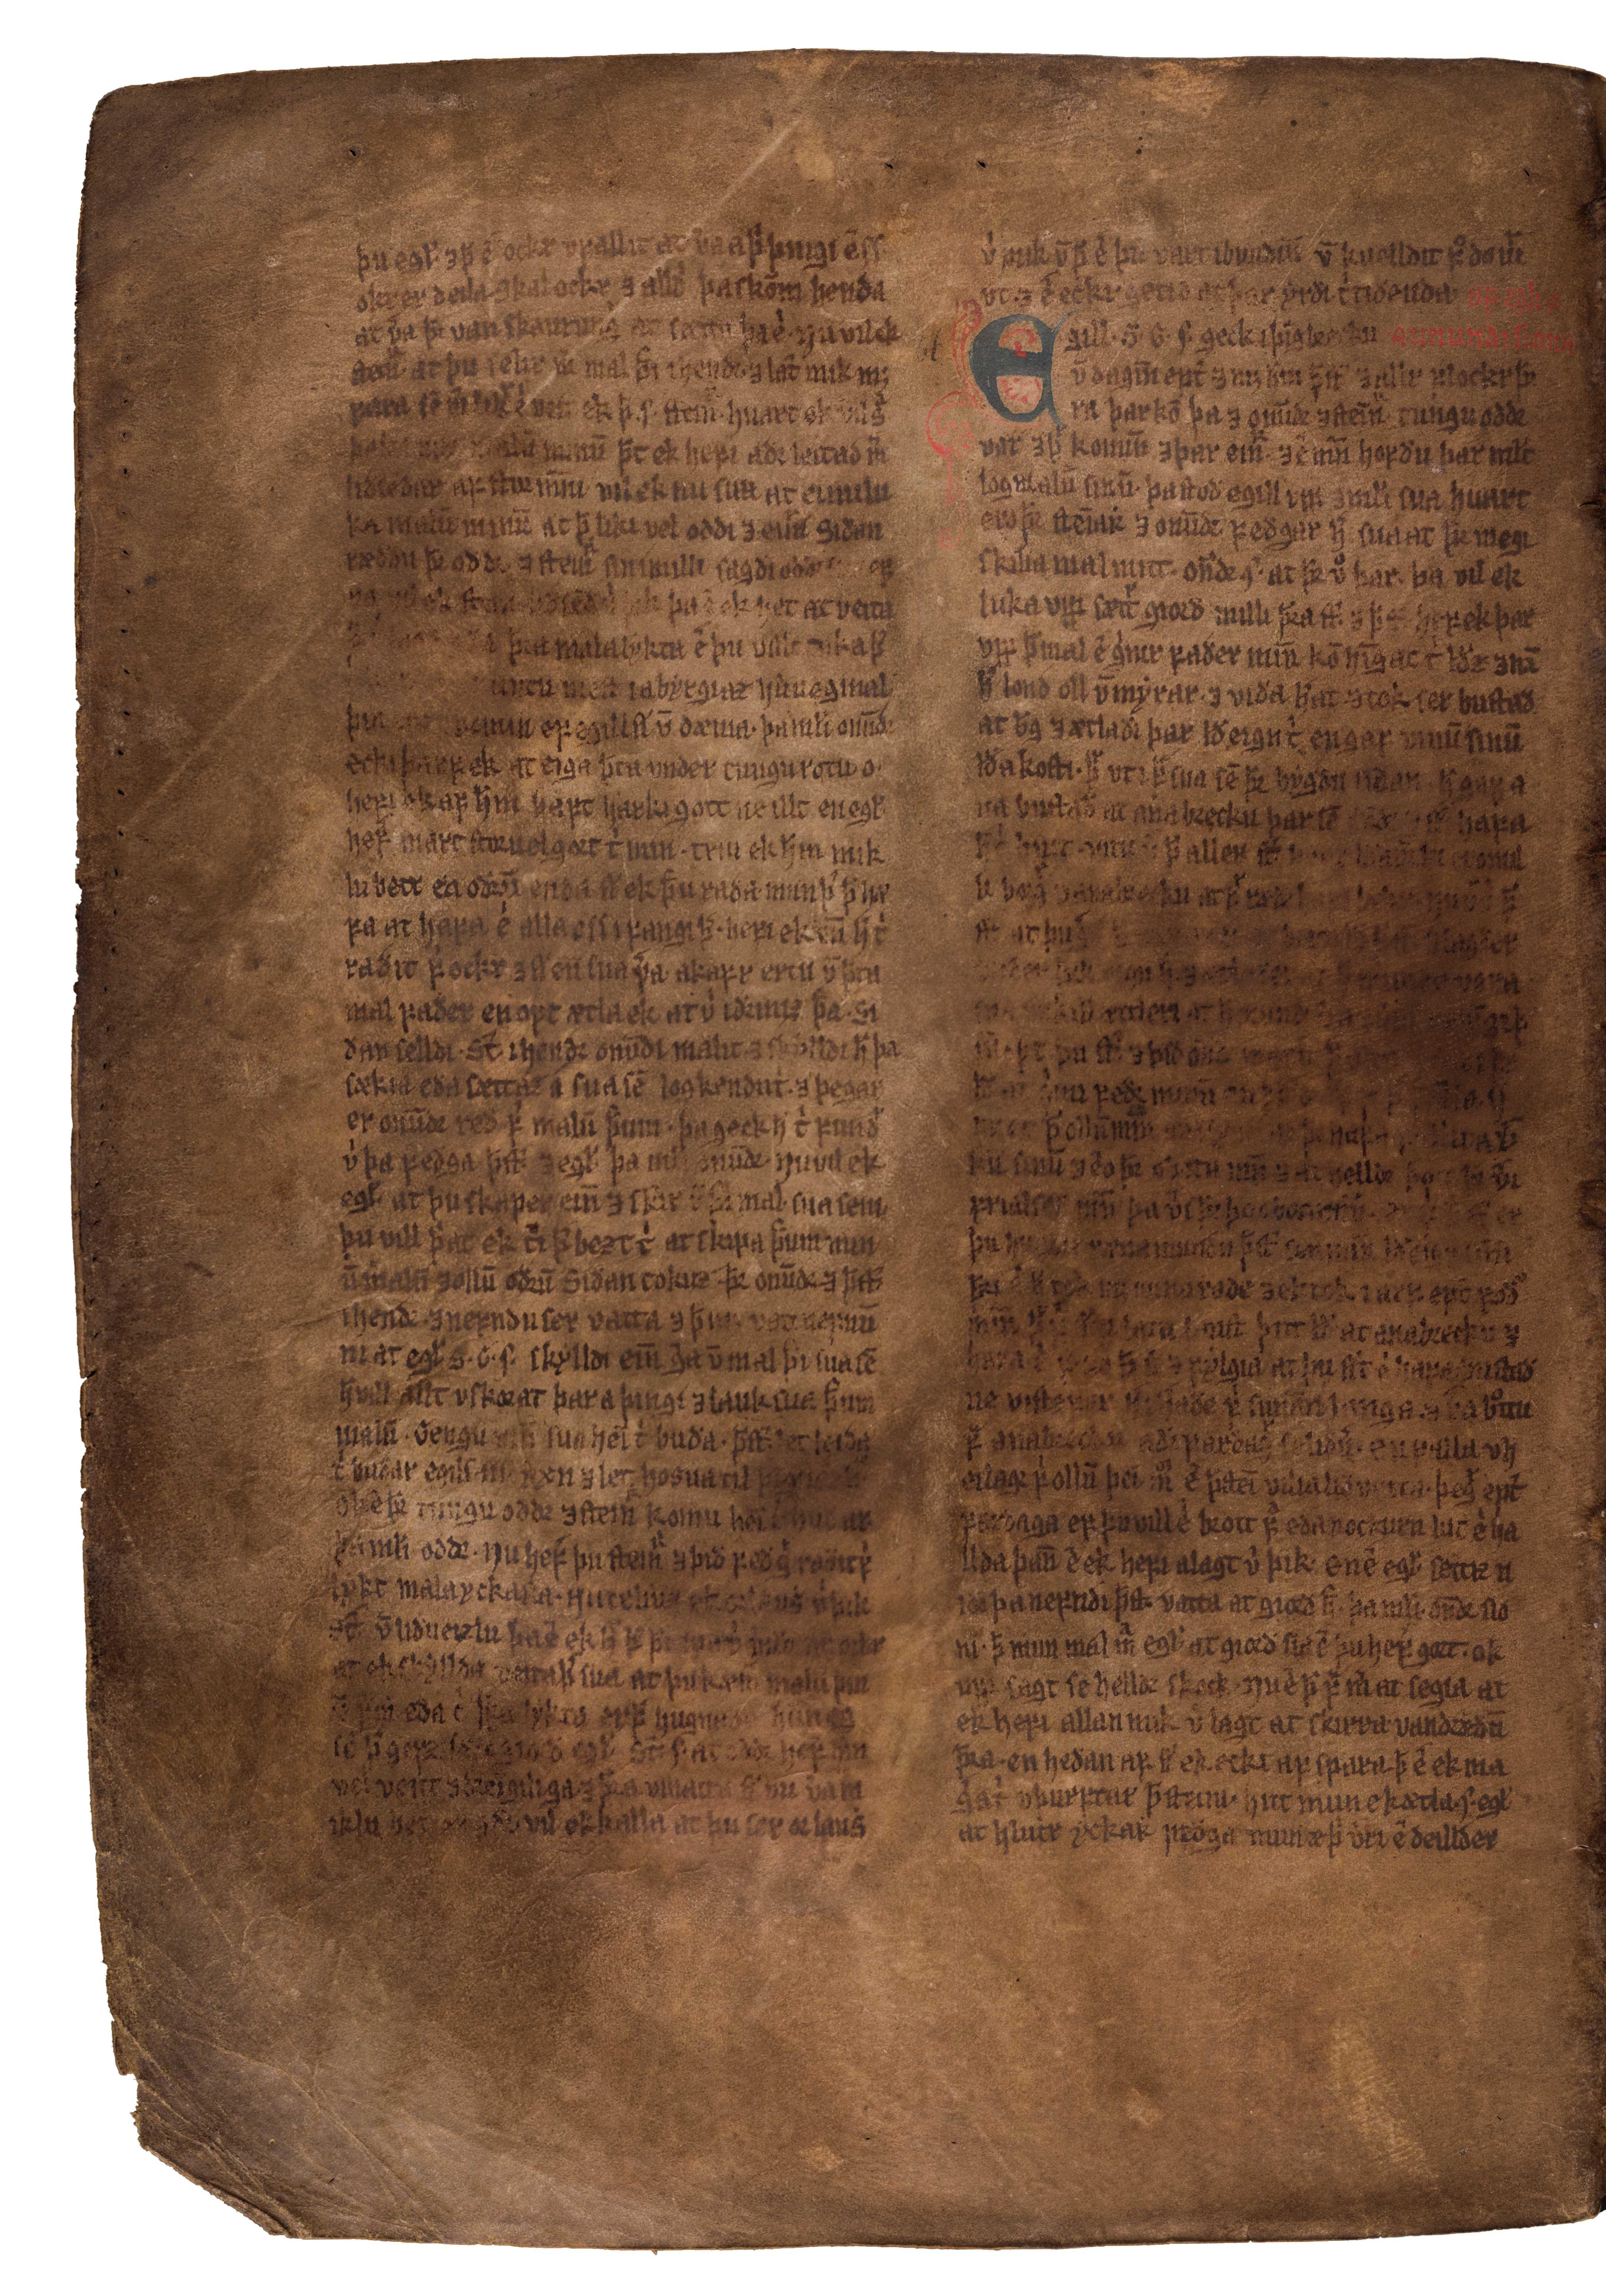 AM 132 fol - 97v